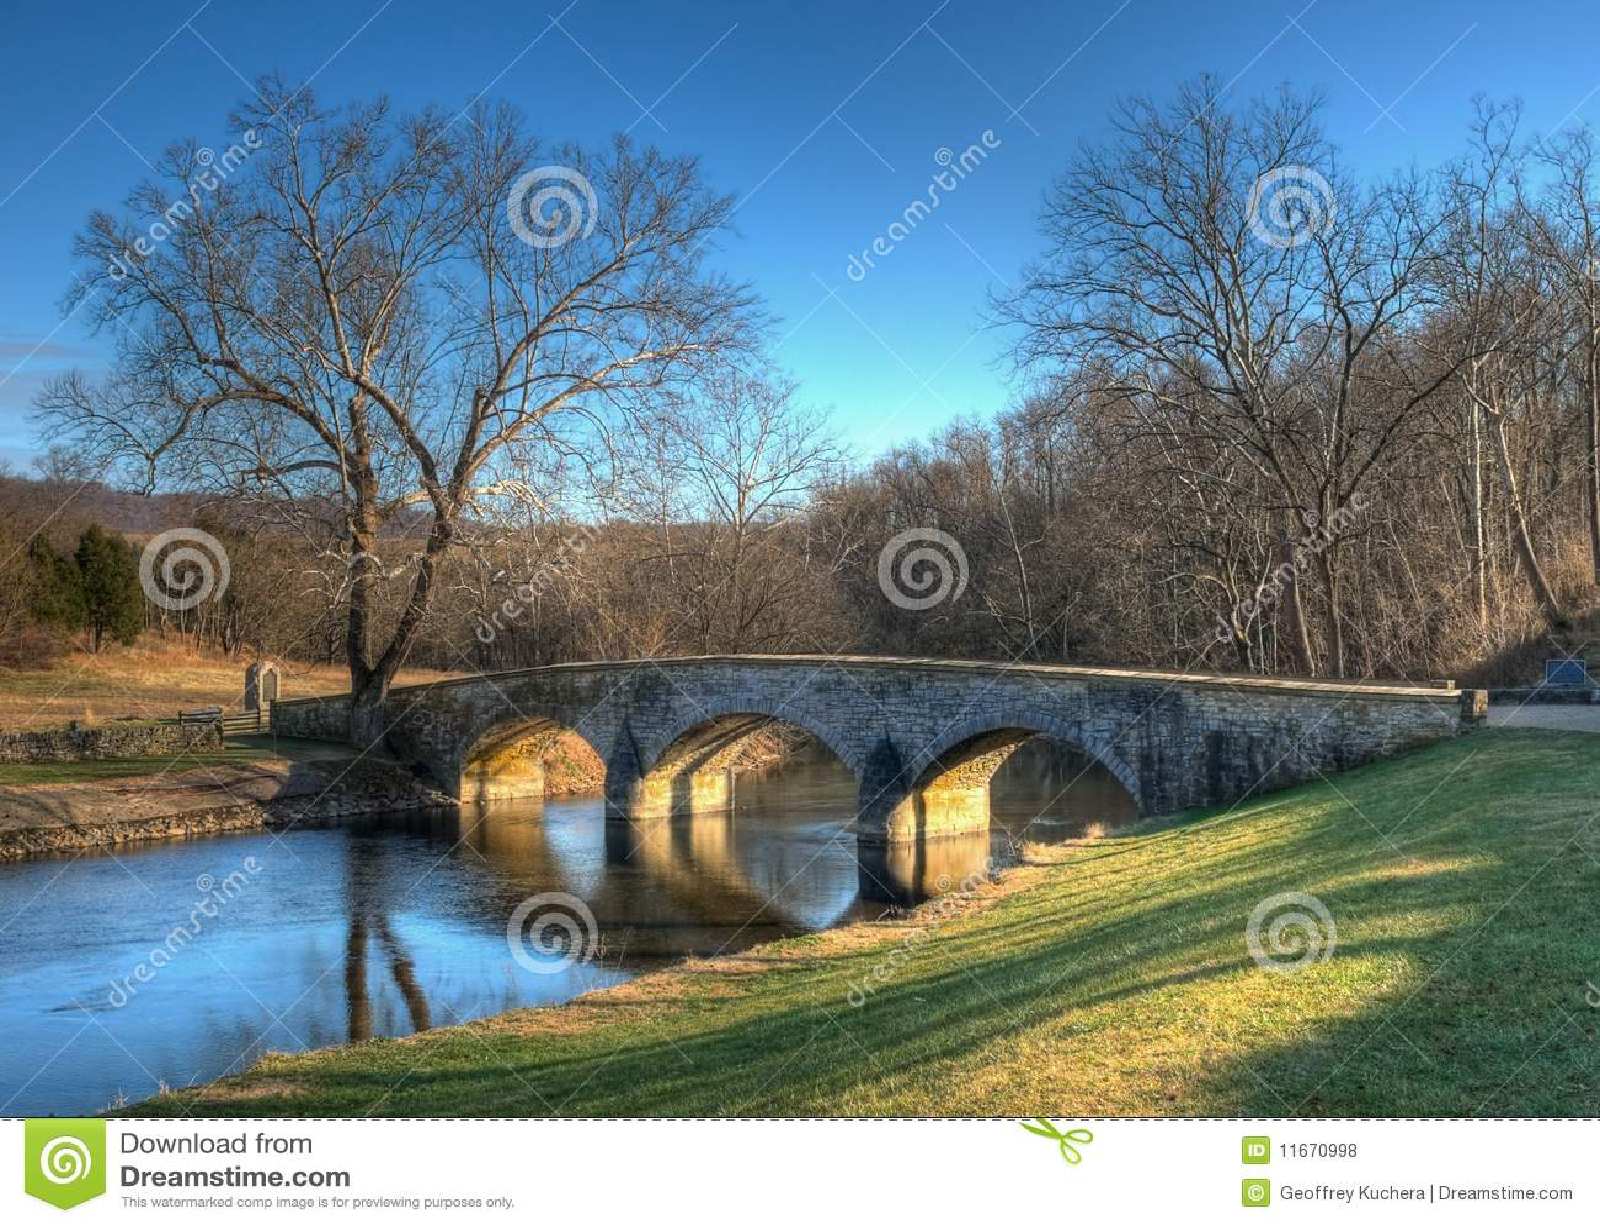 Burnside s Bridge in Sharpsburg, Maryland